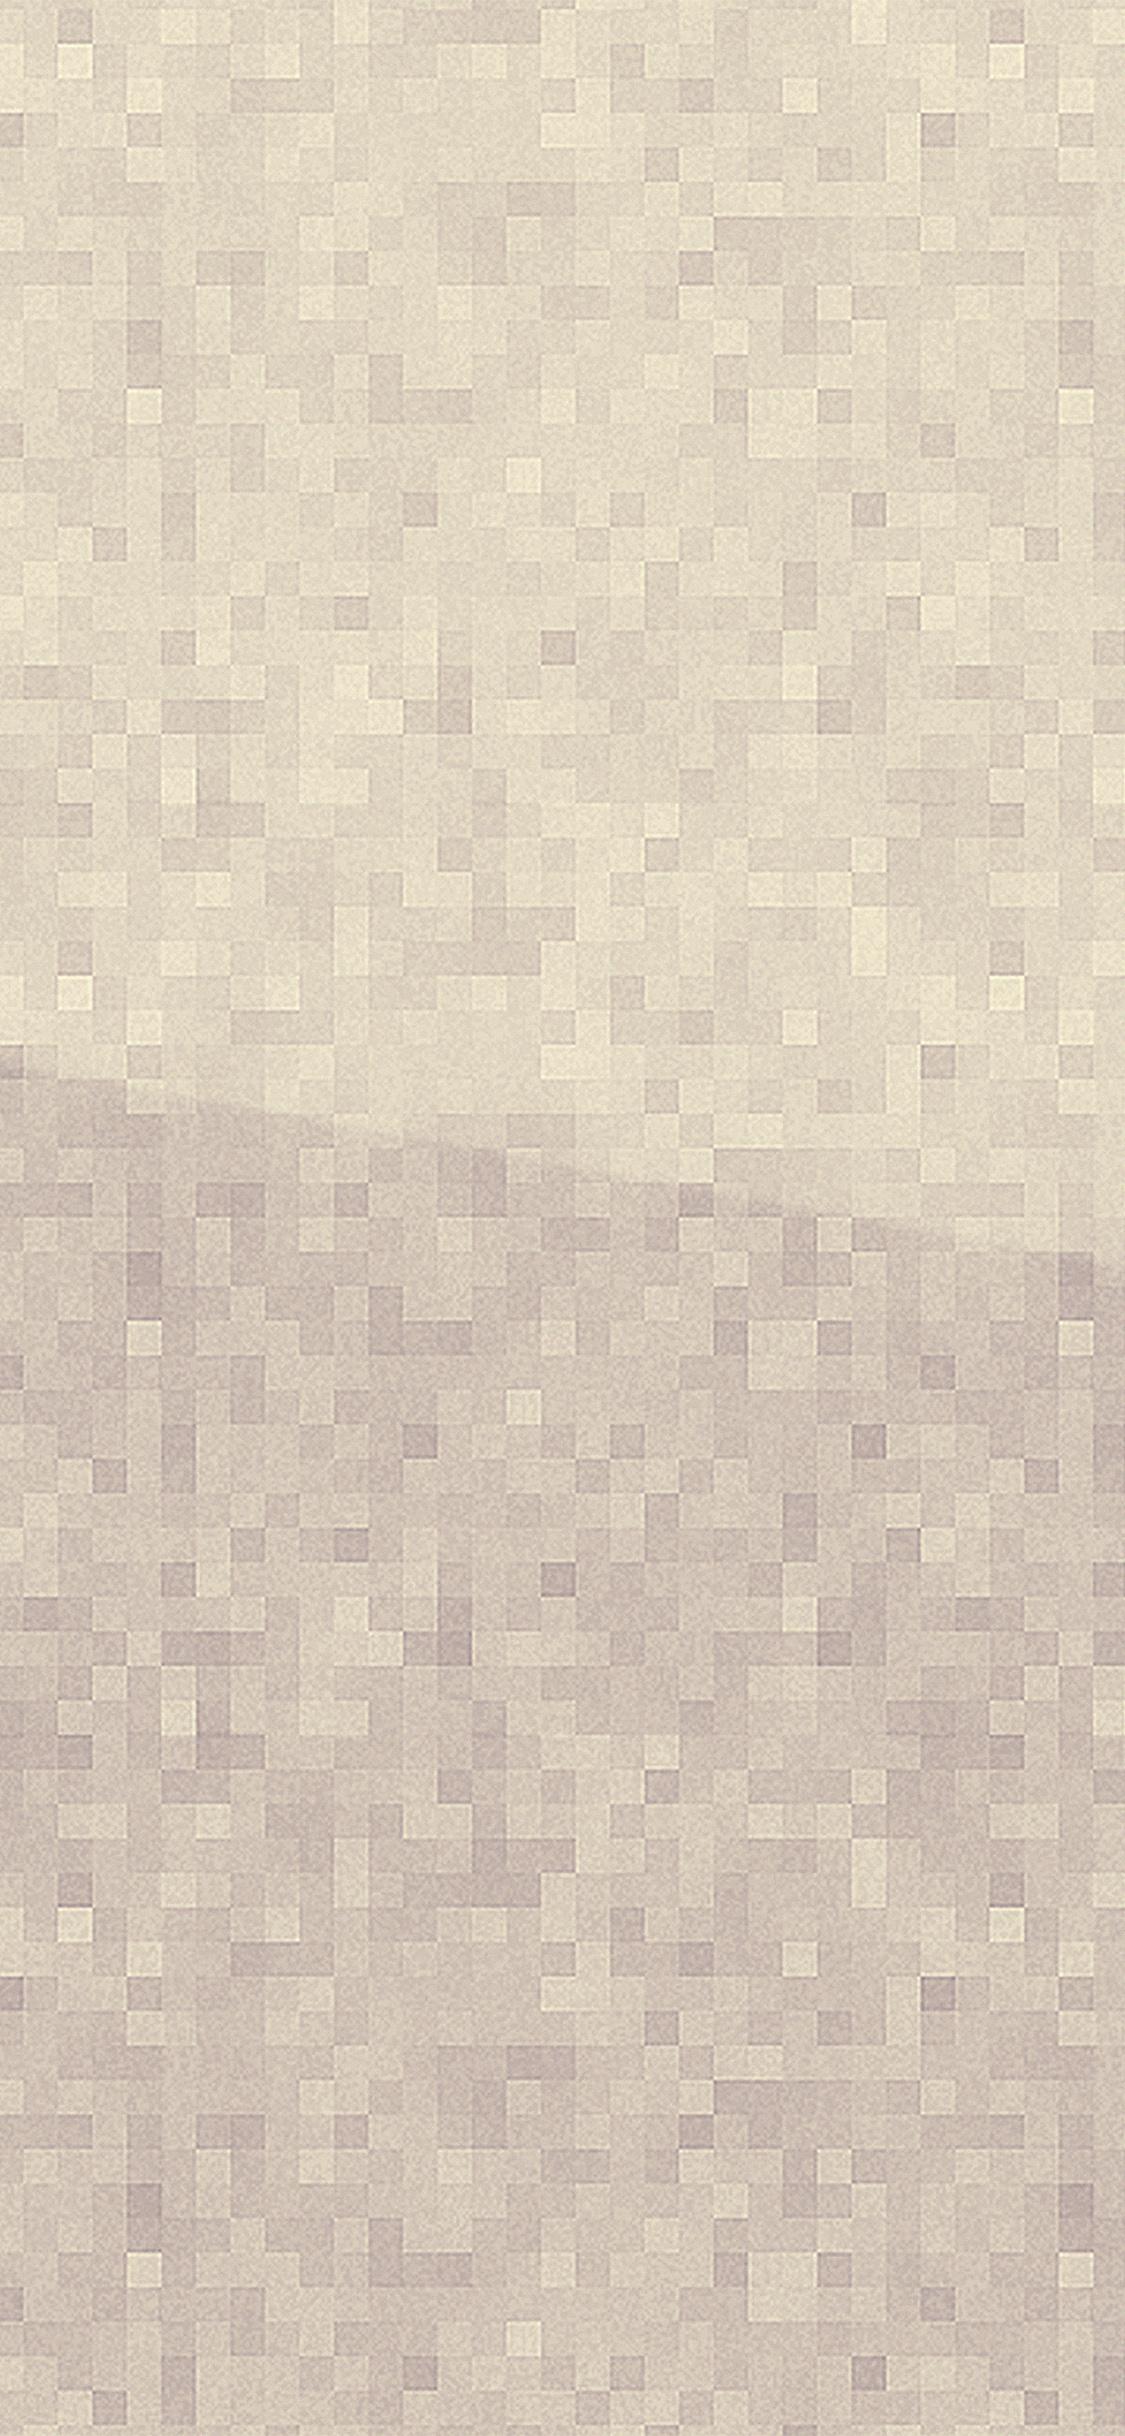 iPhoneXpapers.com-Apple-iPhone-wallpaper-vj52-cube-mosaic-pattern-dark-yellow